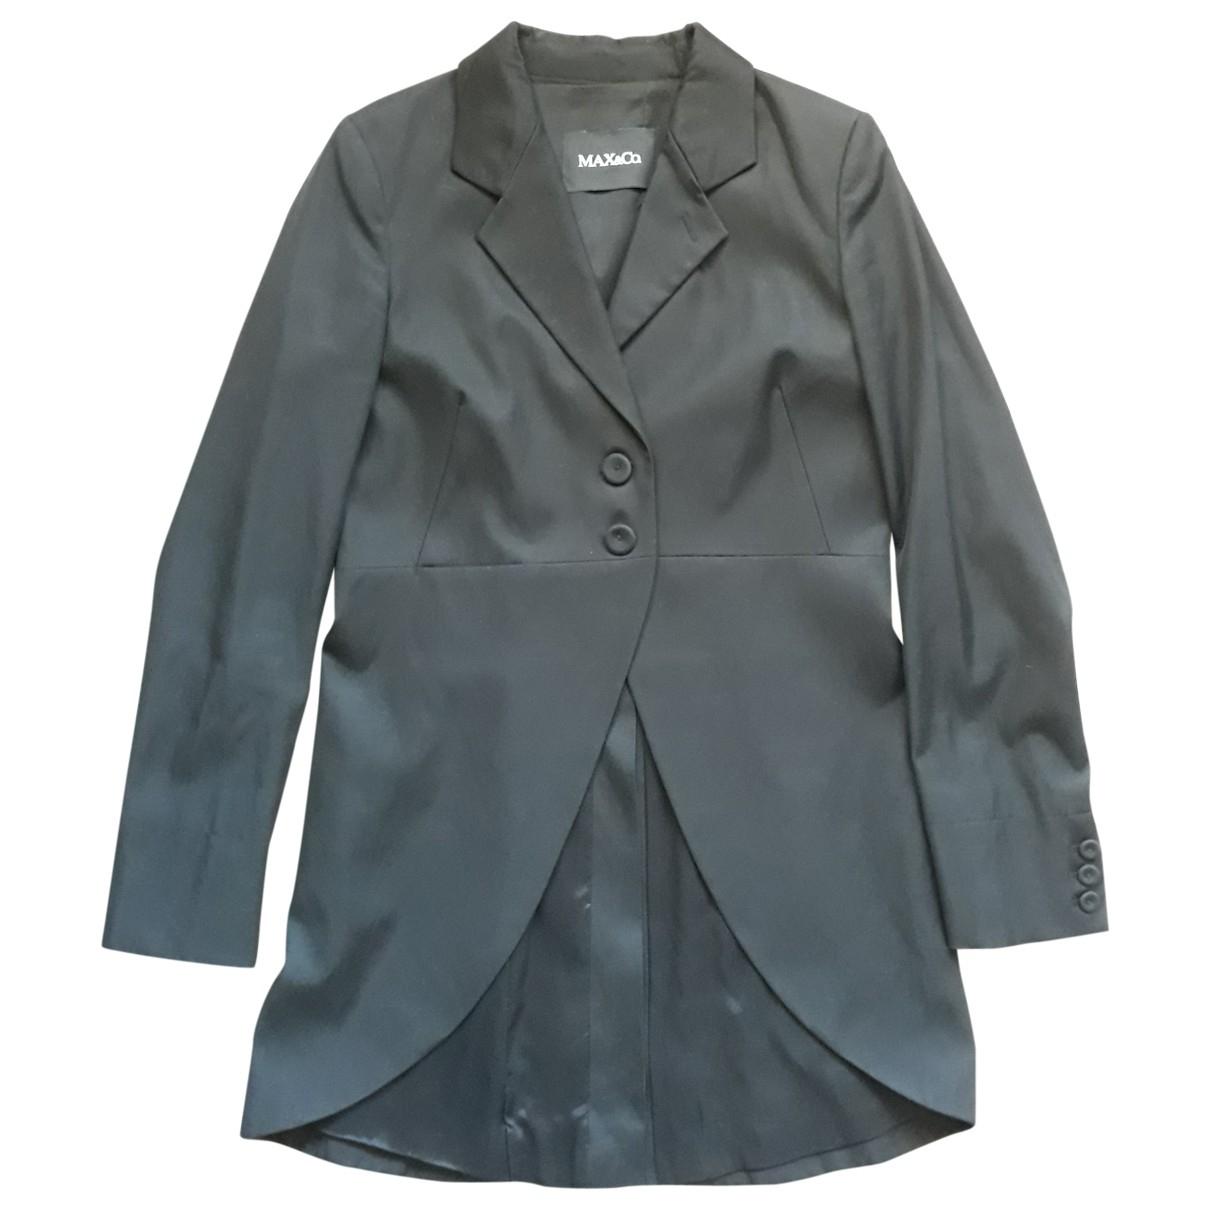 Max & Co \N Black Cotton jacket for Women 44 IT